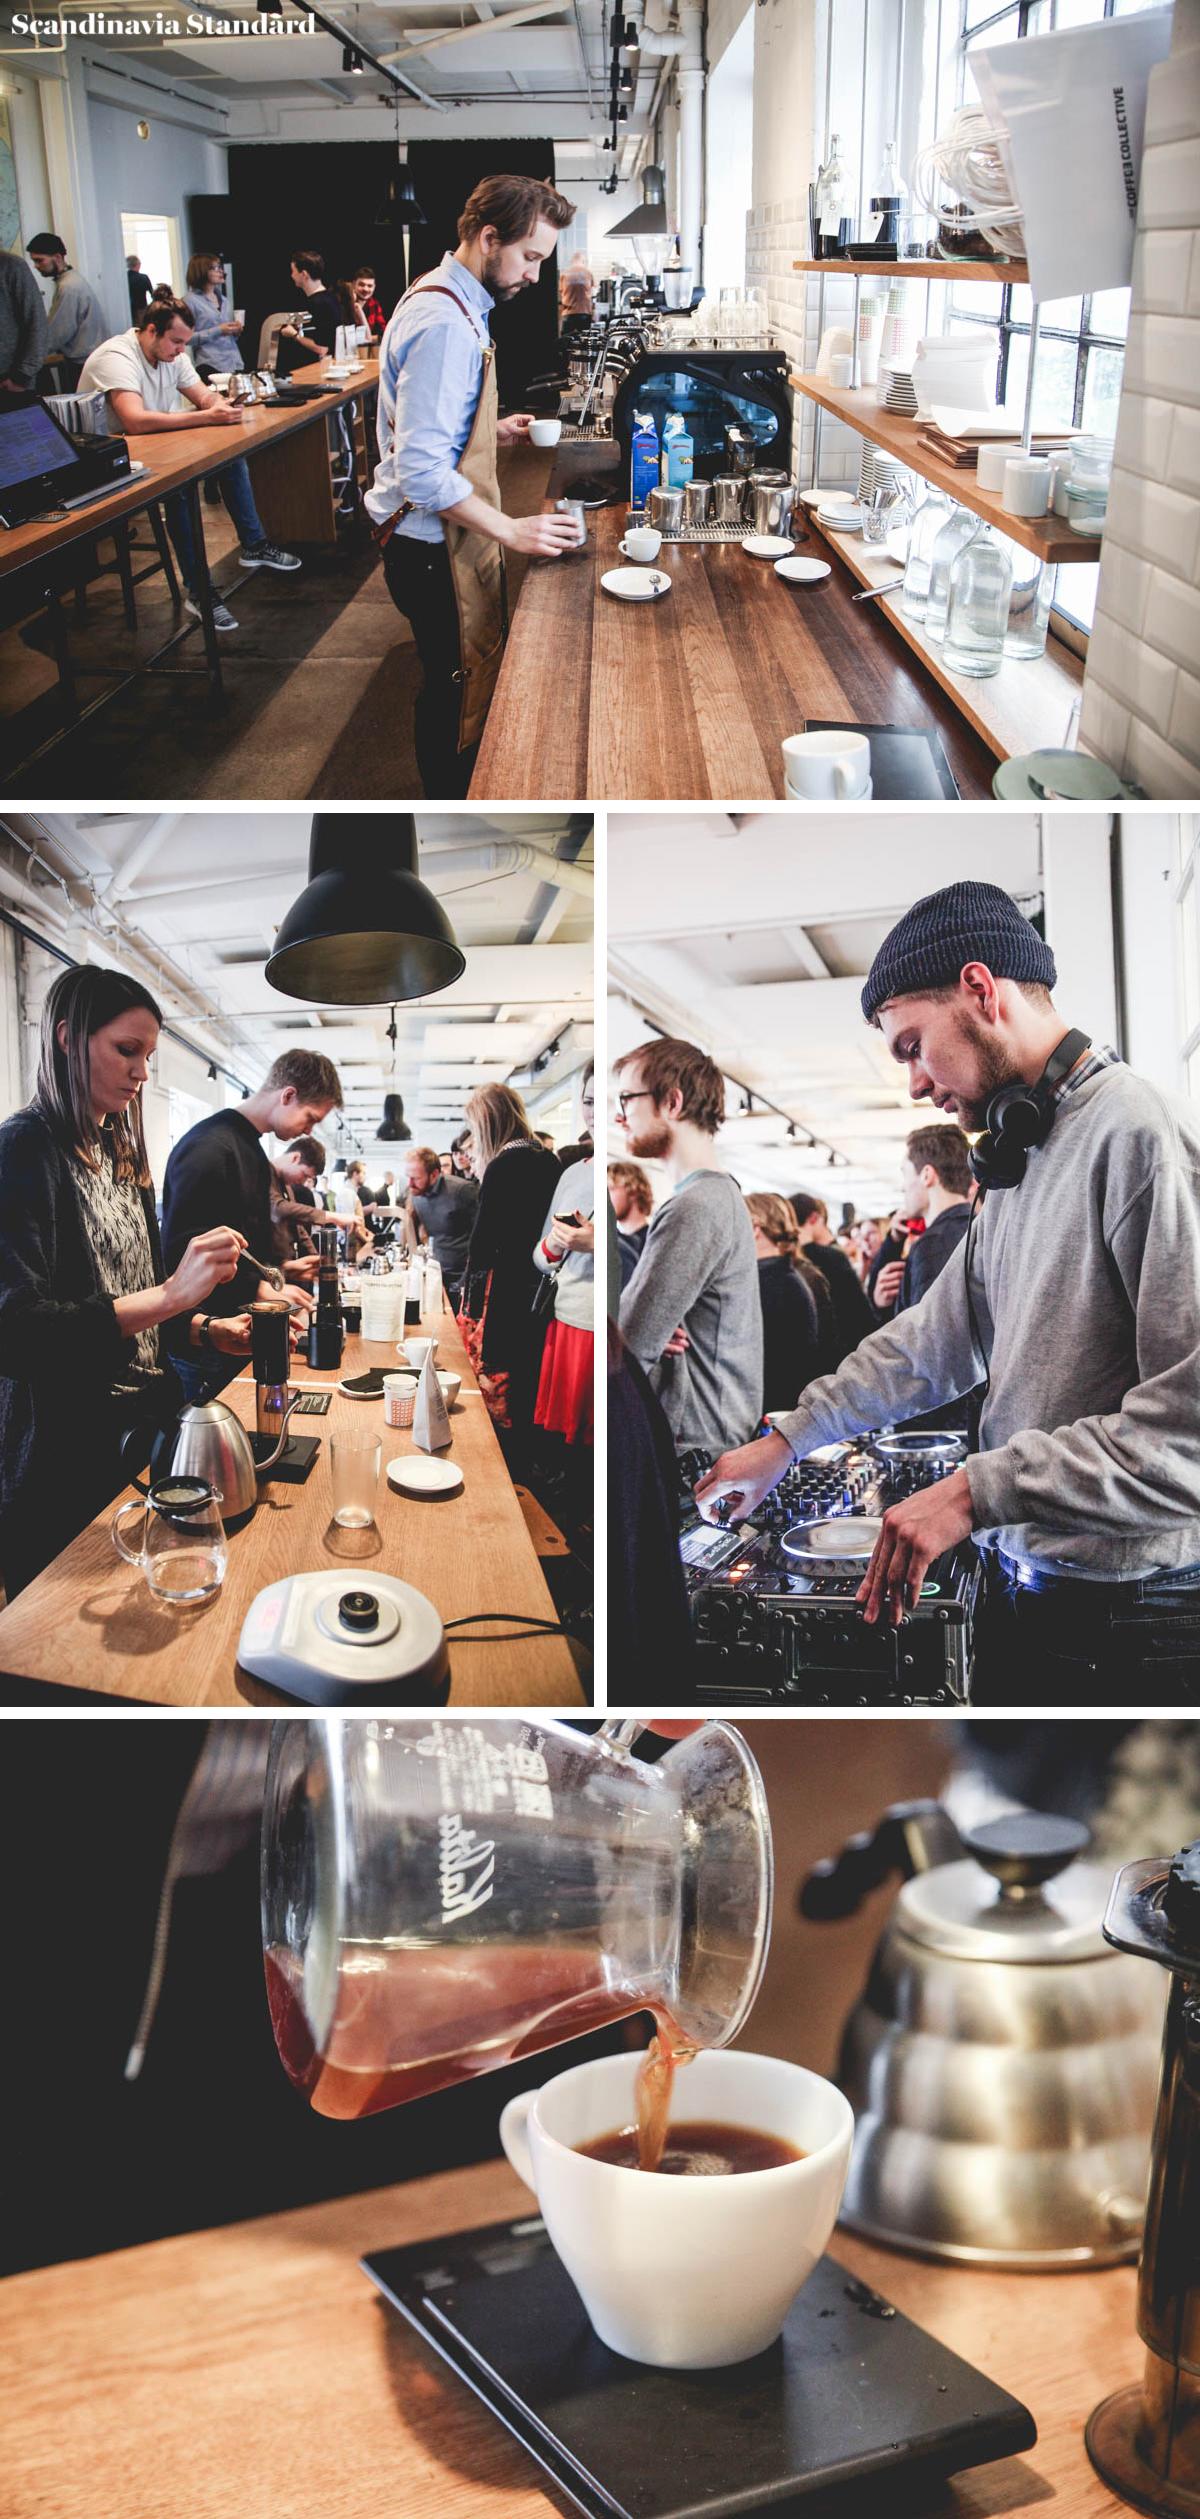 Aeropress Championship Collage Copenhagen | Coffee Collective | Scandinavia Standard